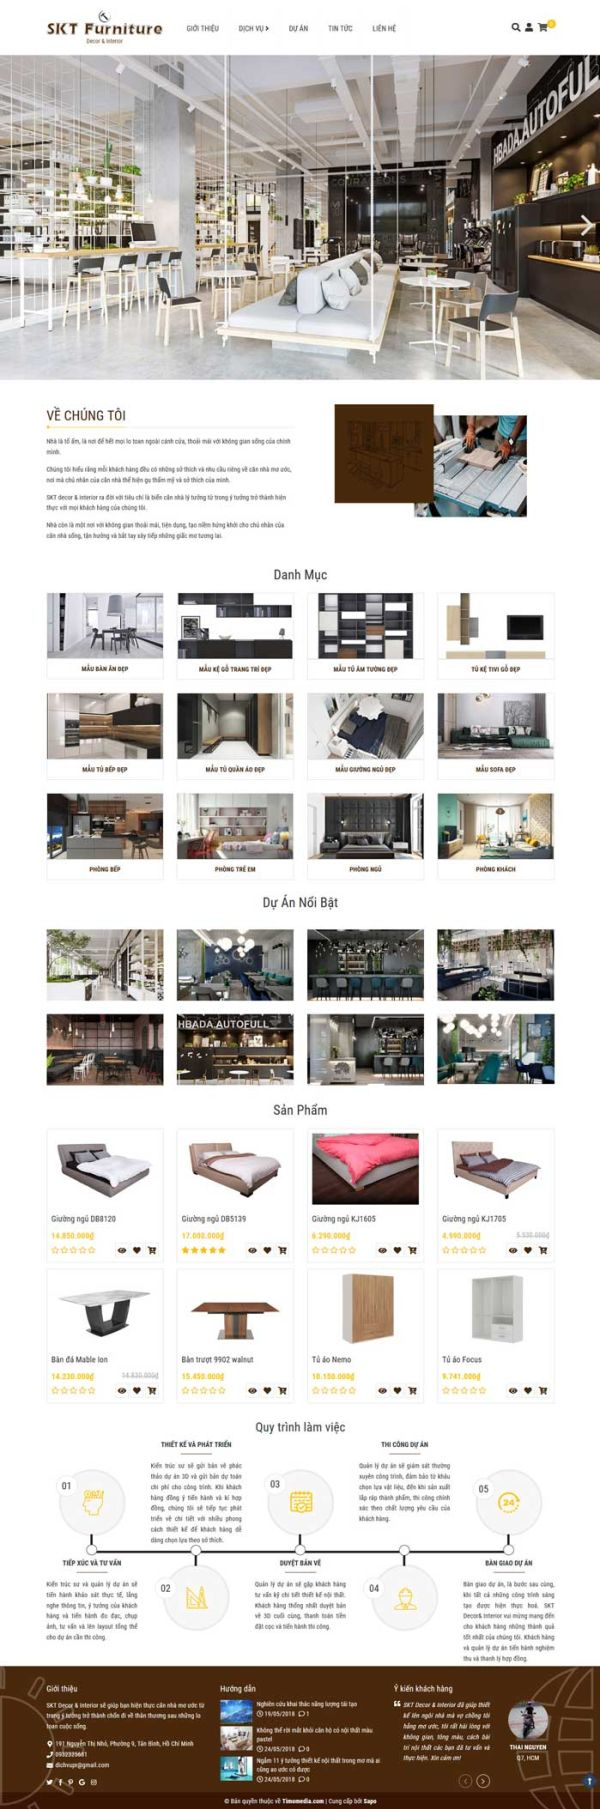 Giao diện mẫu web nội thất 2